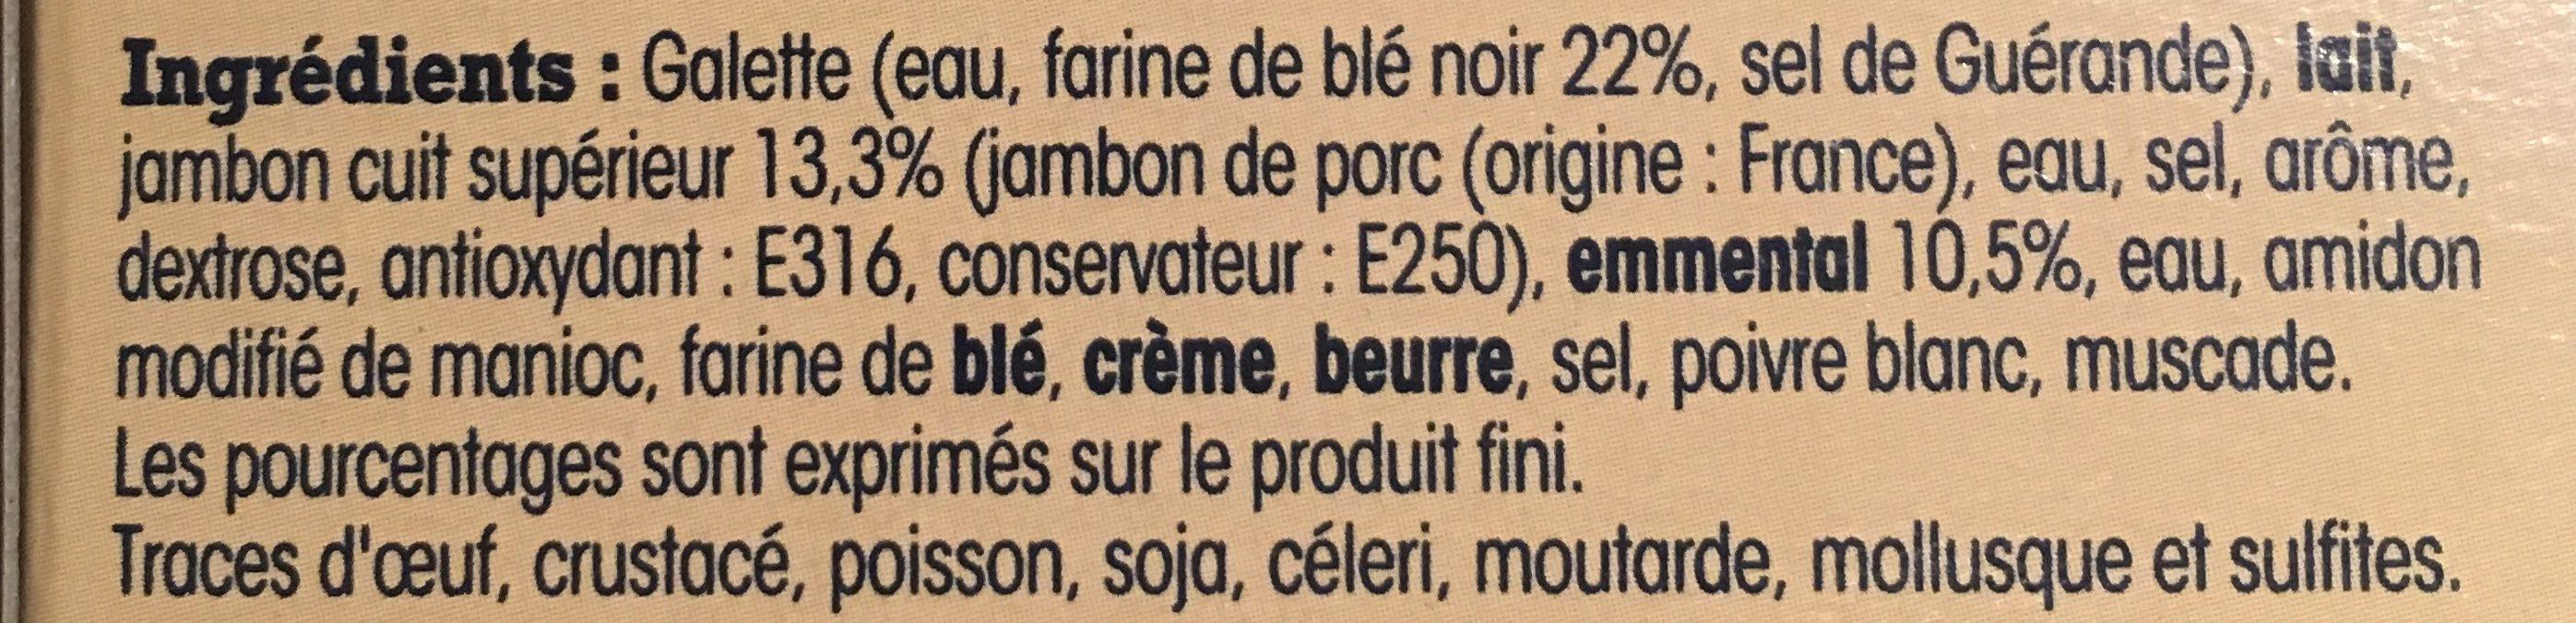 2 Galettes de Sarrasin de Bretagne Recette Campagnarde, Jambon et Emmental - Ingrédients - fr